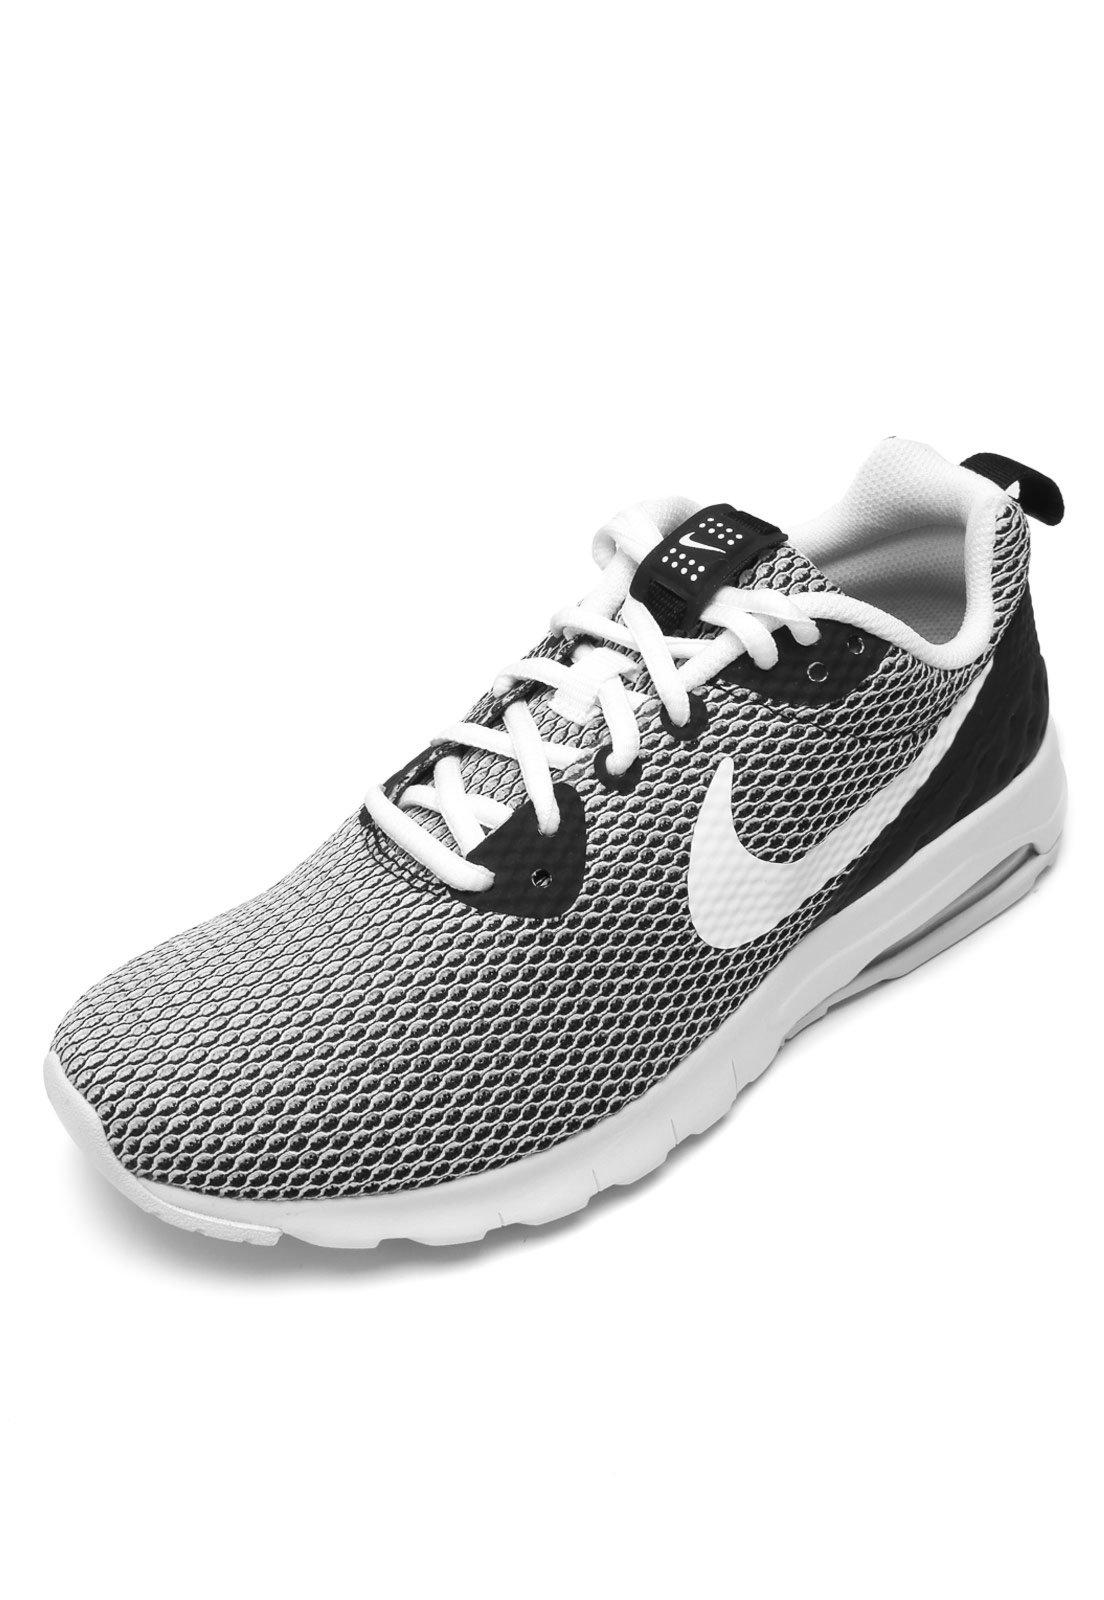 aed7d1edfd Tênis Esportivo Nike Sportswear AIR MAX MOTION LW SE Branco - Compre Agora